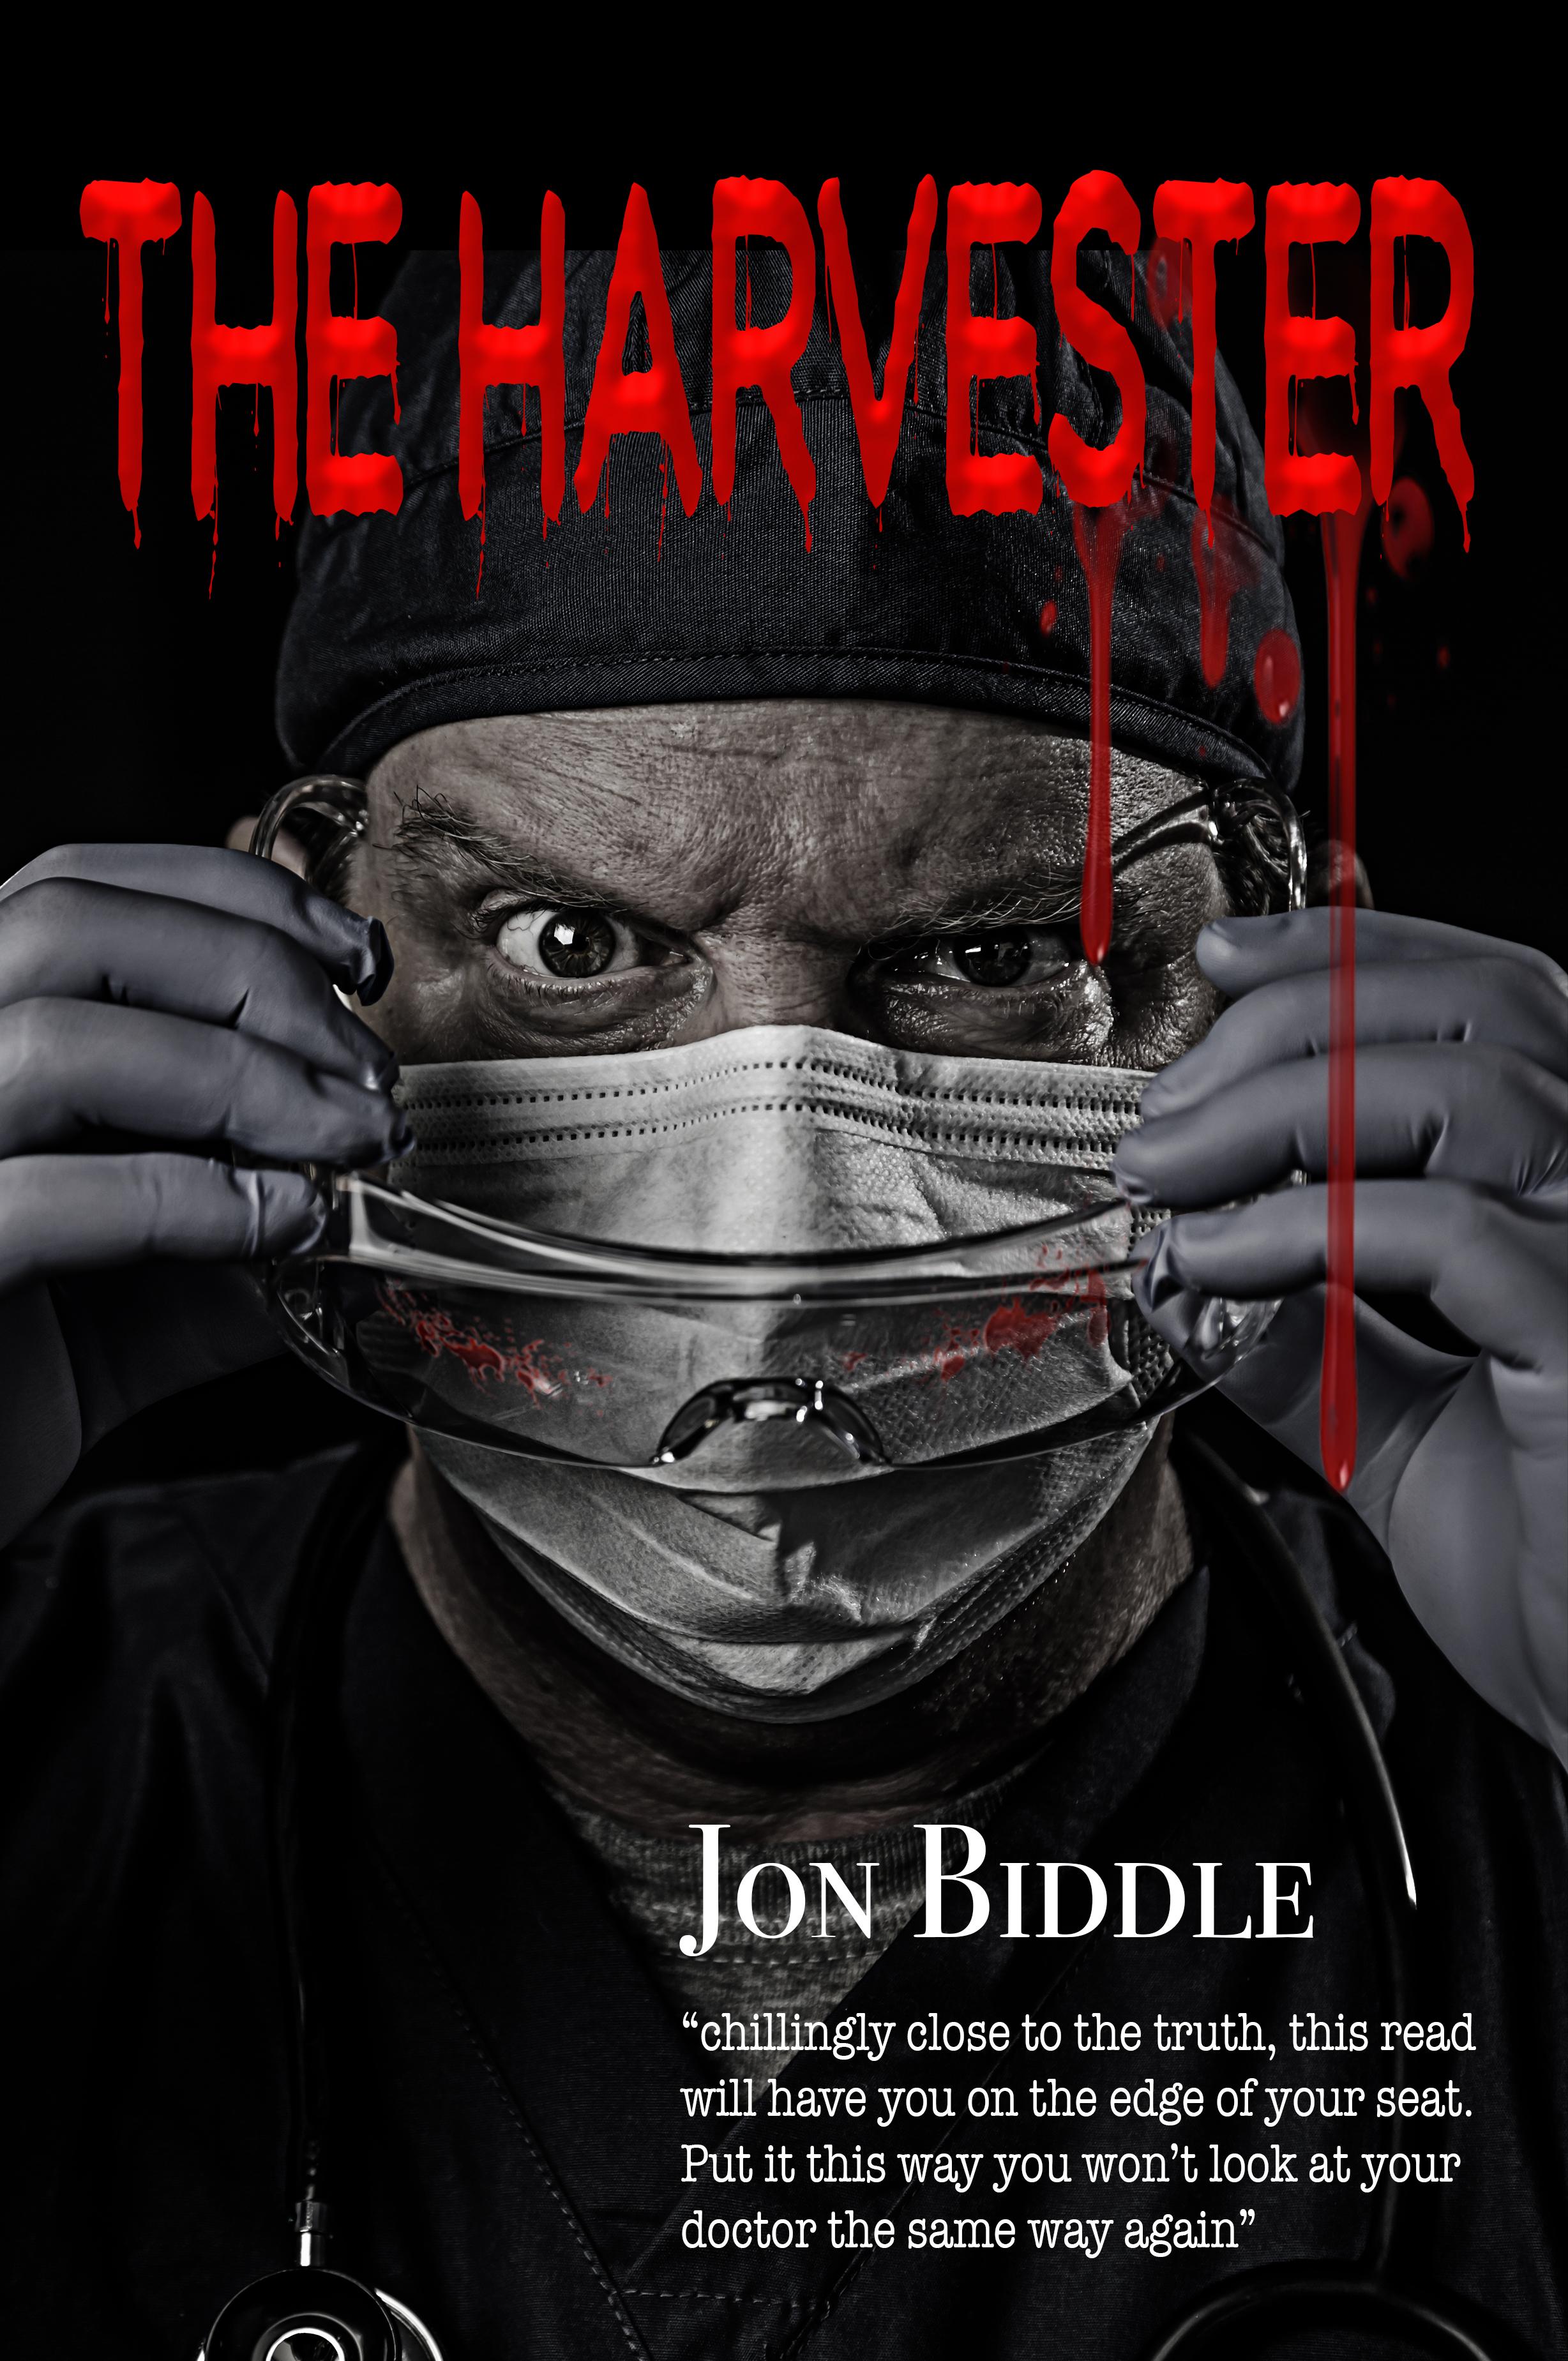 The Harvester, my debut novel